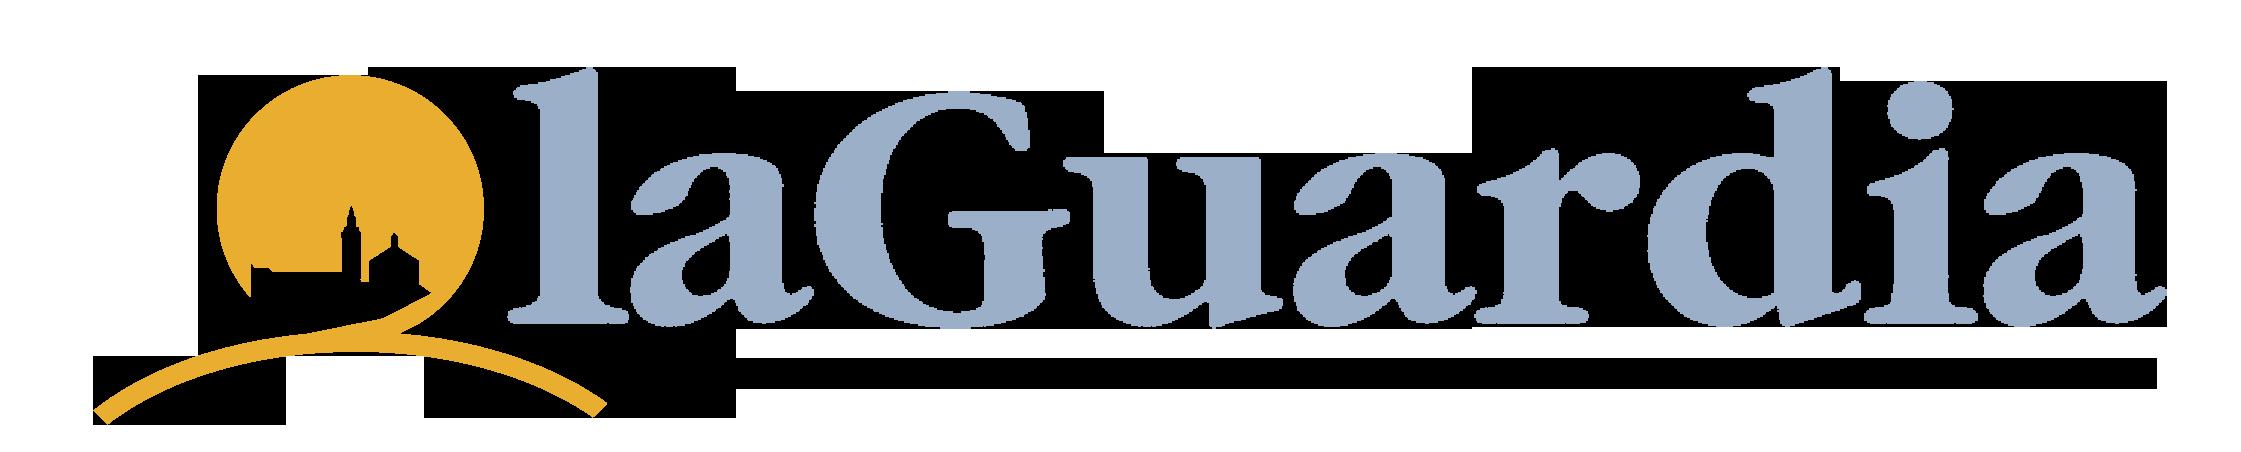 laGuardia - rivista del santuario n.s. della guardia a genova